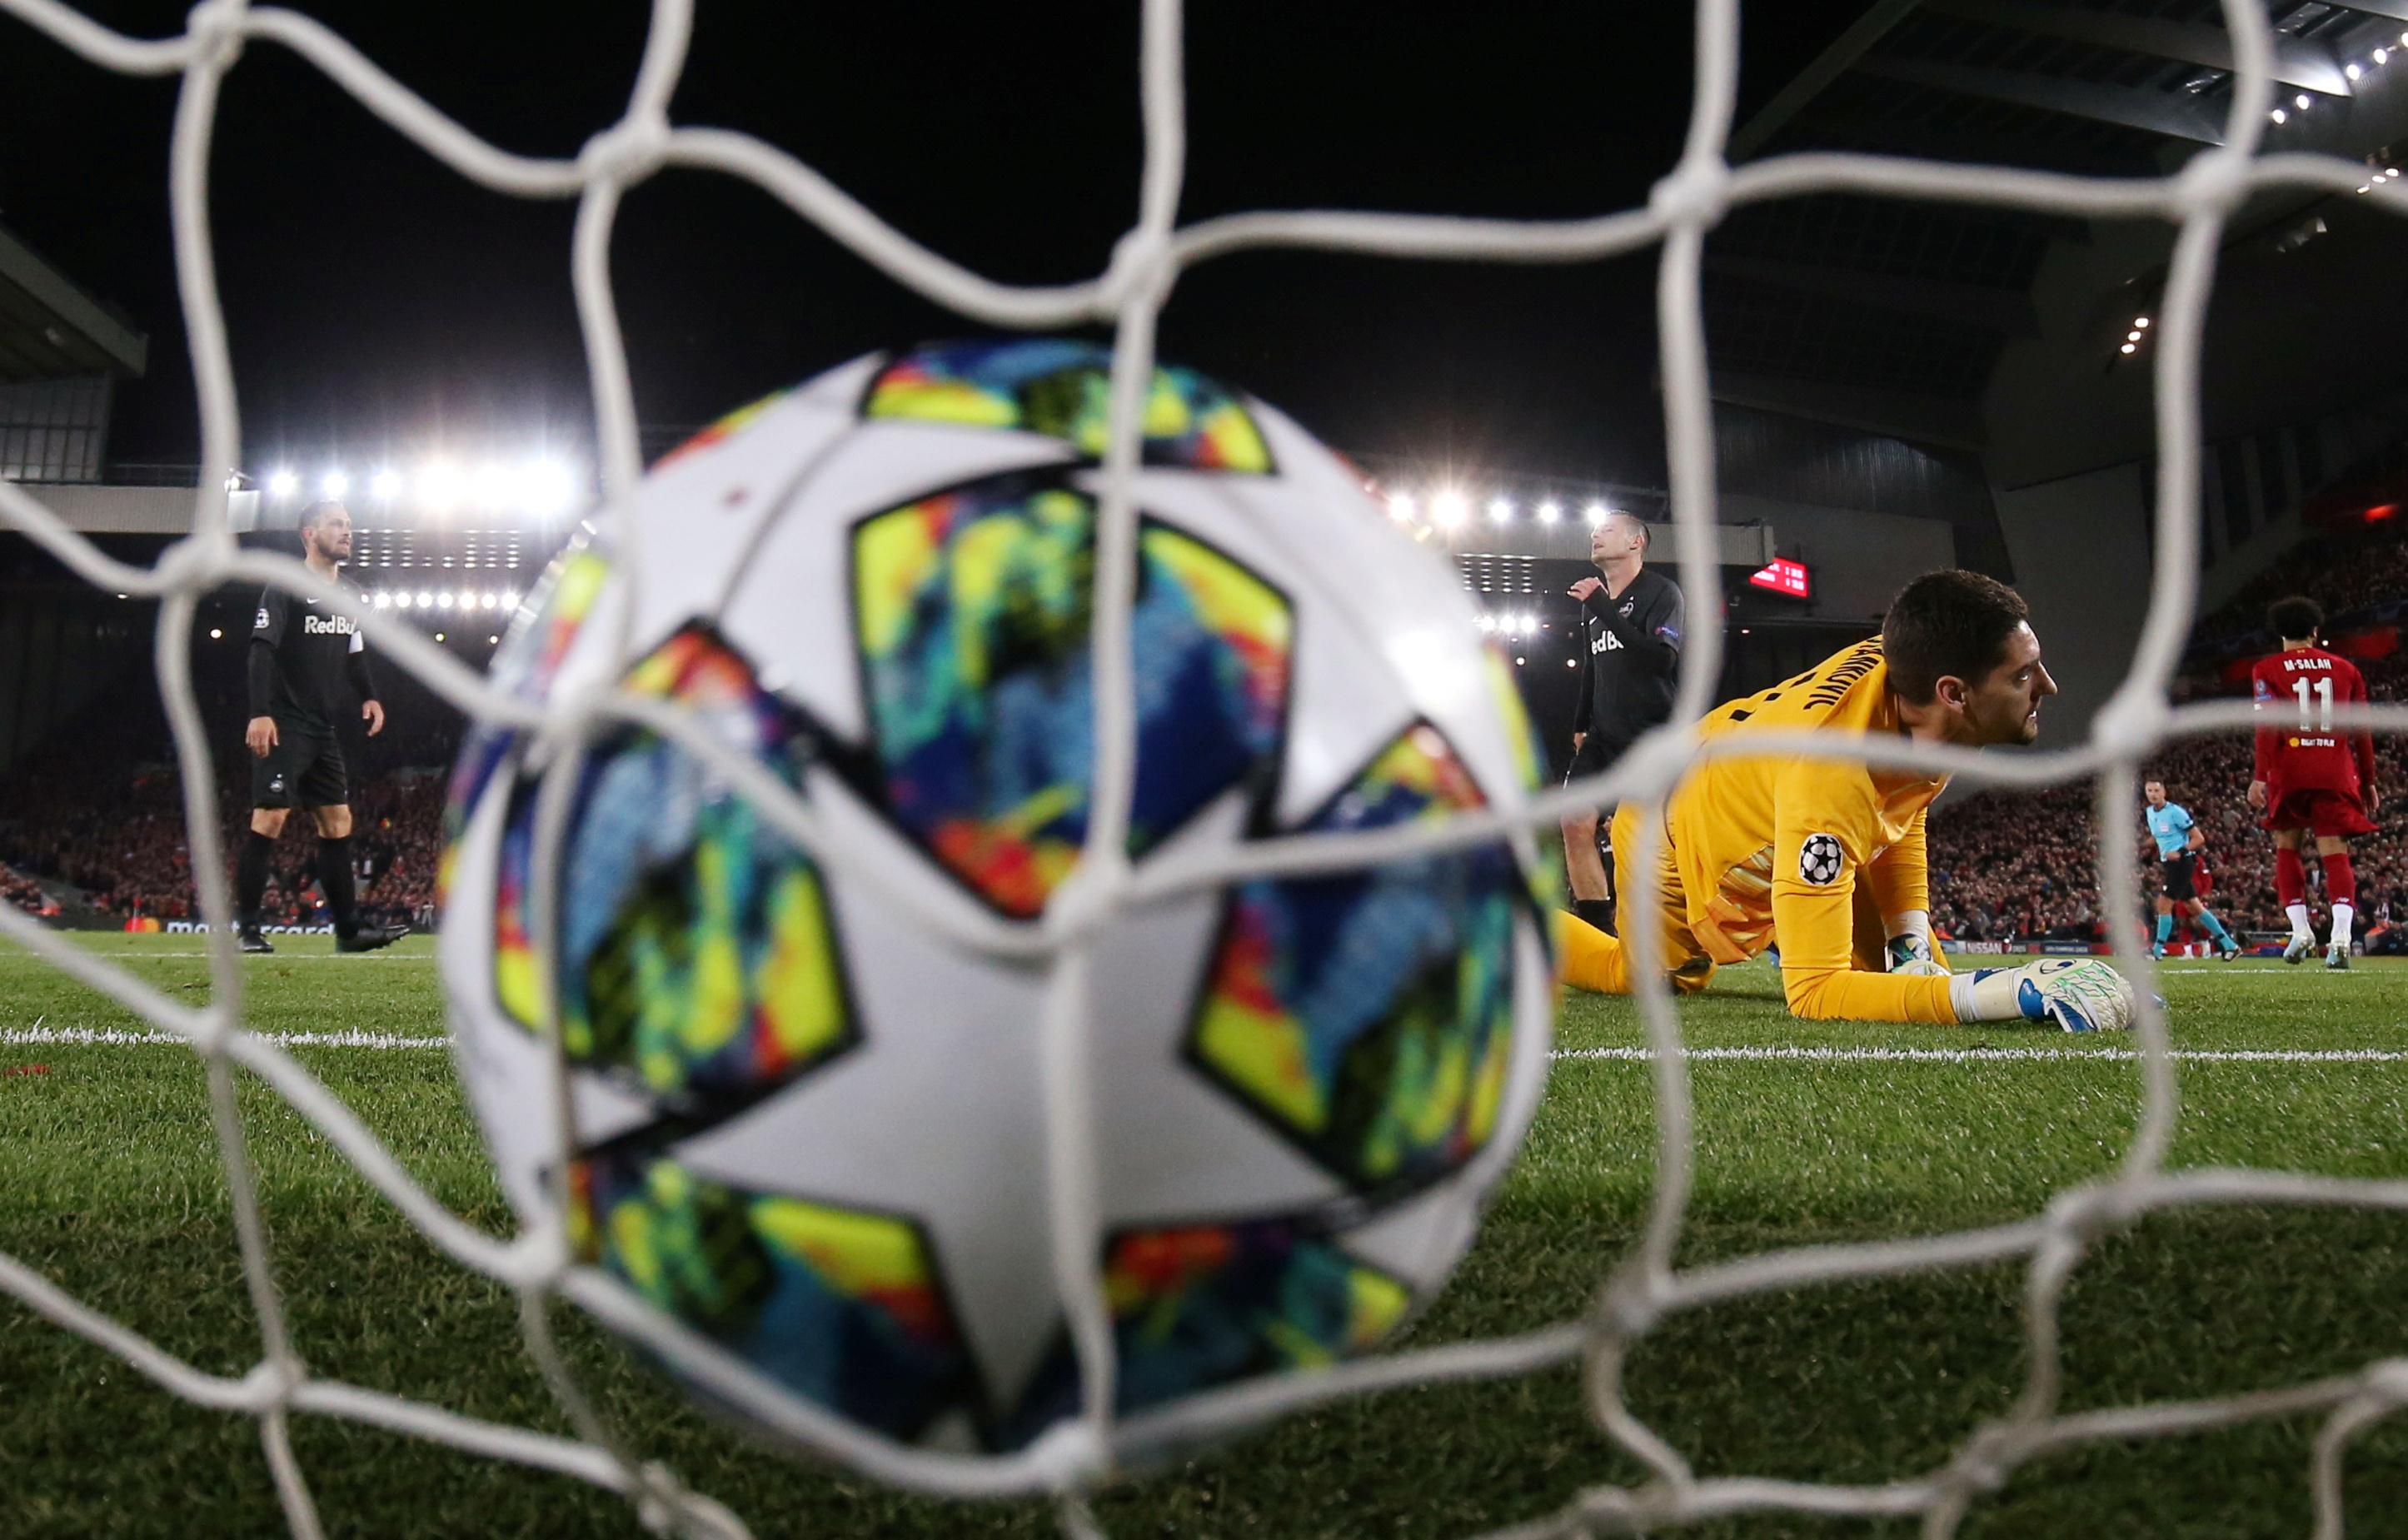 Champions League: Προβάδισμα για ομίλους η Μάλμε, «ζωντανή» η Αϊντχόφεν με την Μπενφίκα